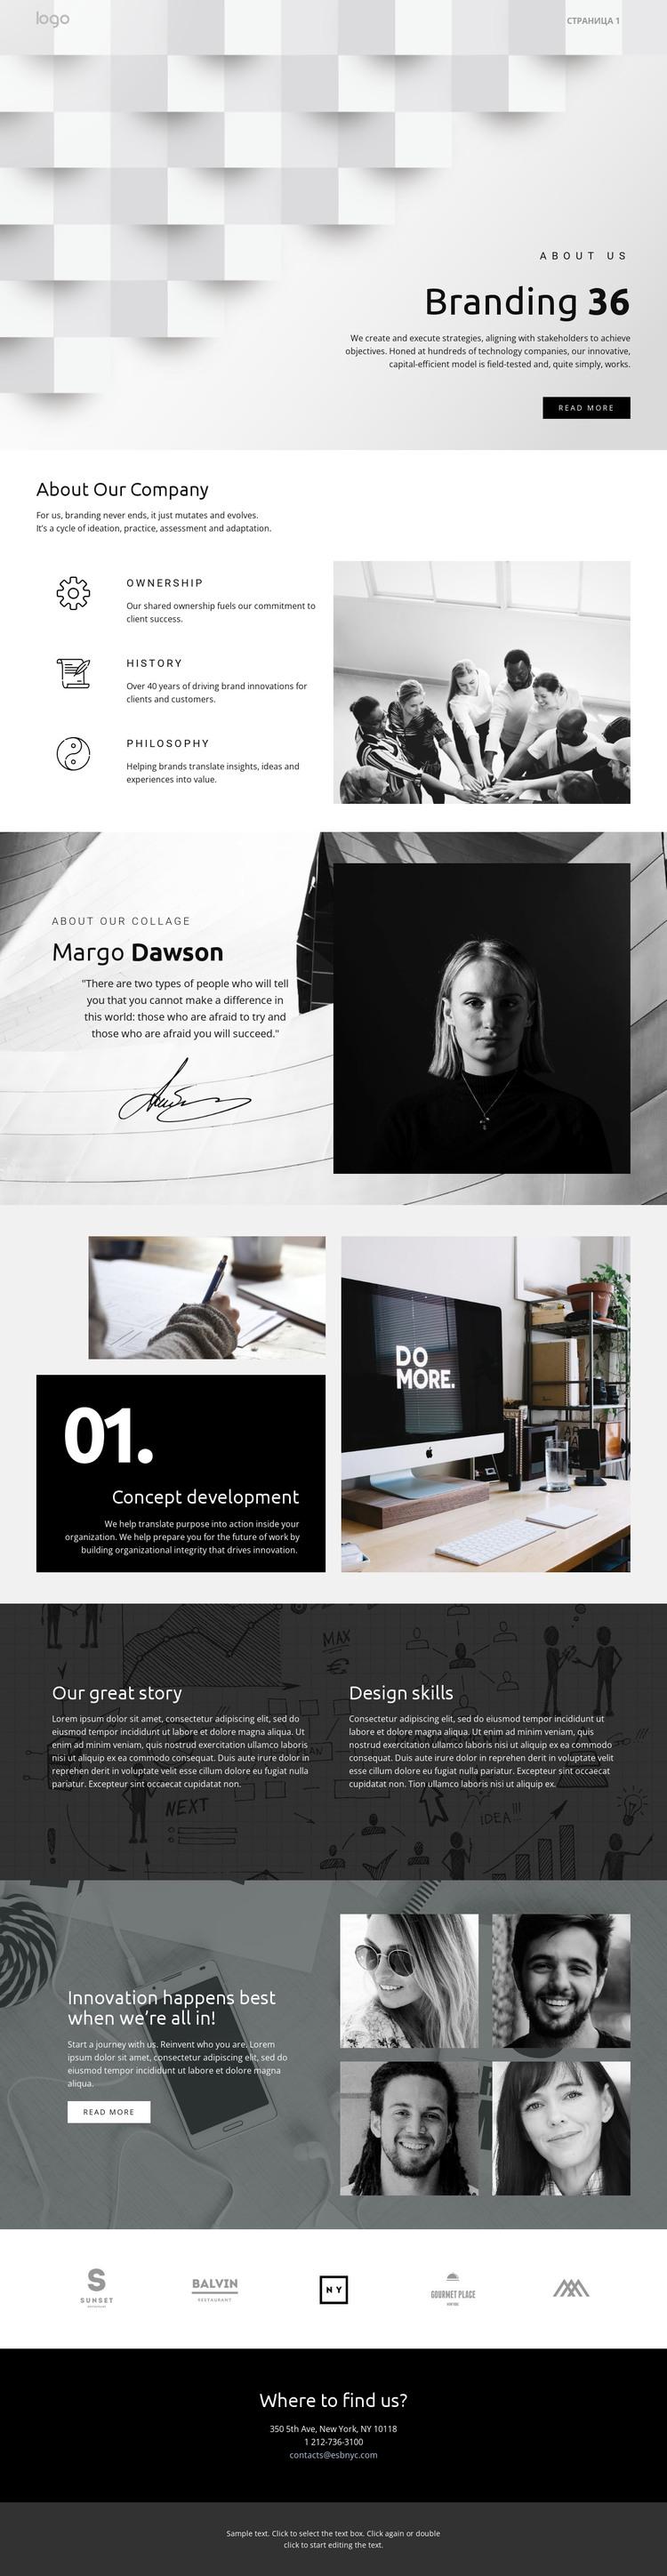 Futuristic standout business Web Design